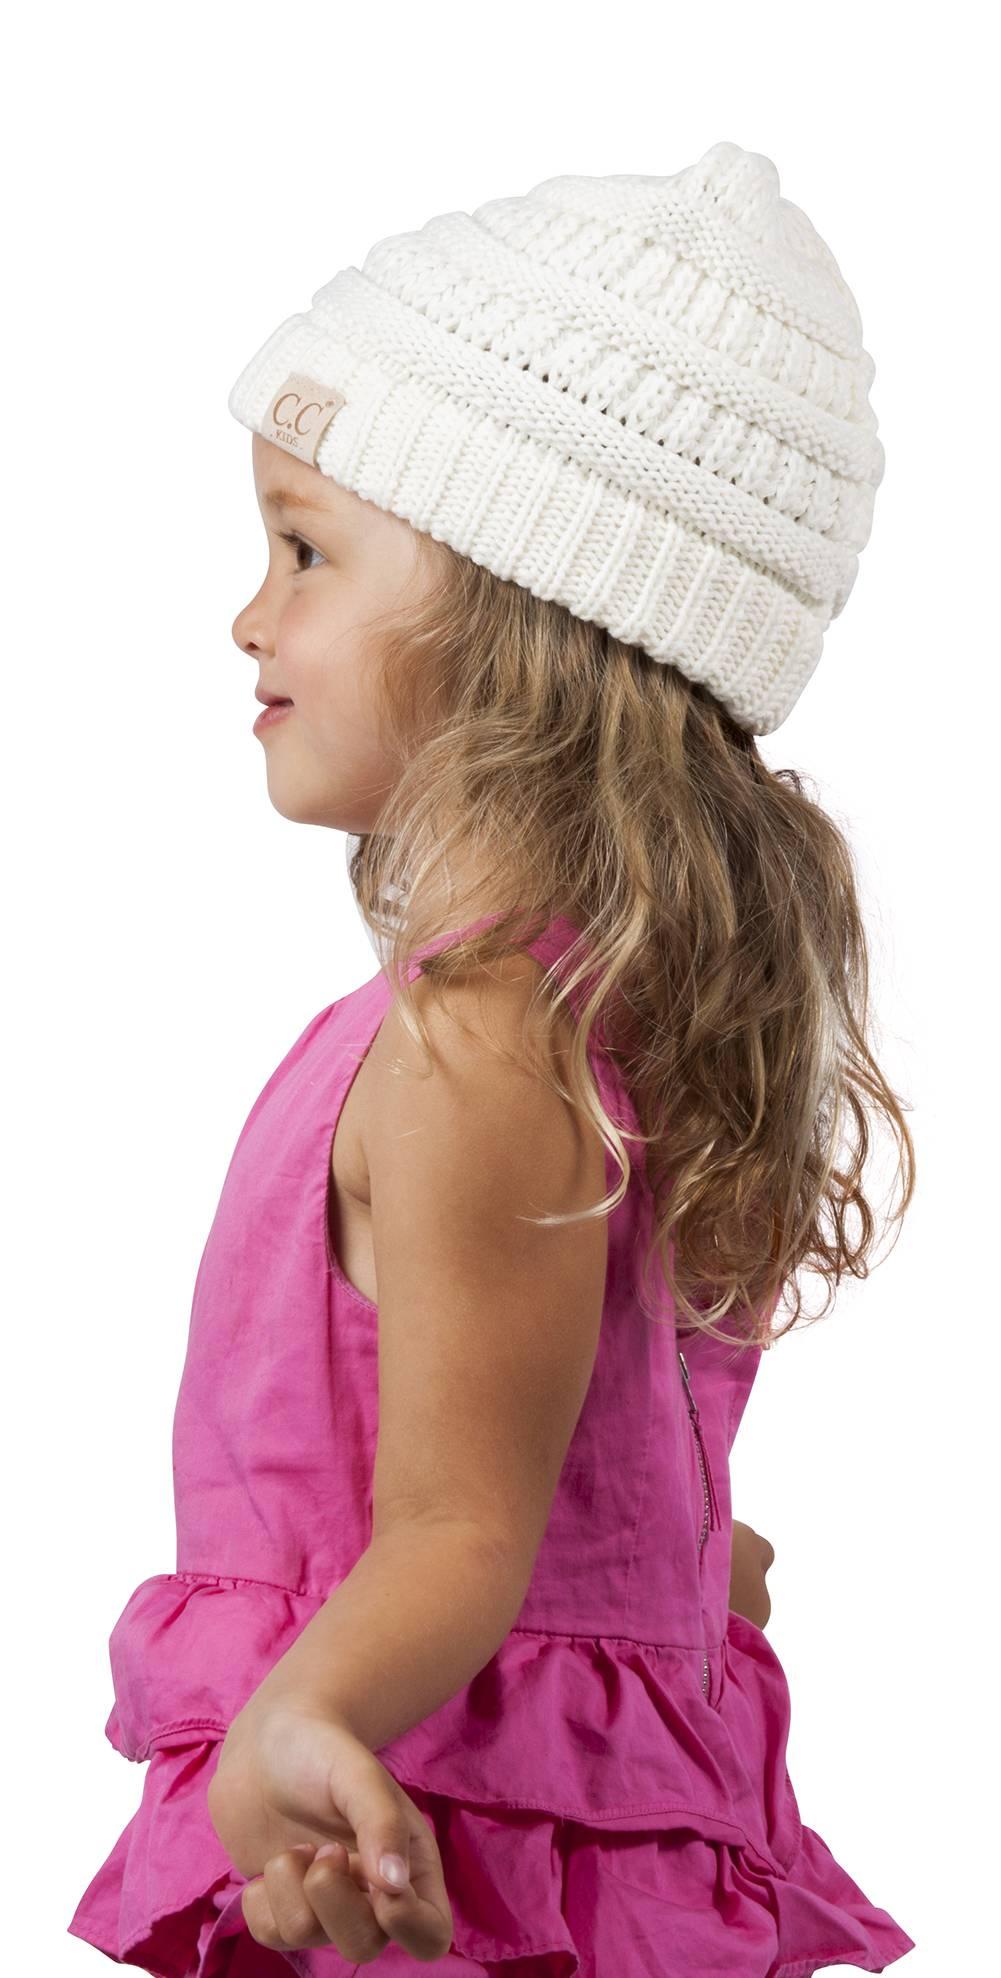 Topheadwear Babies Kids Dinosaur Hand-knitted Beanie